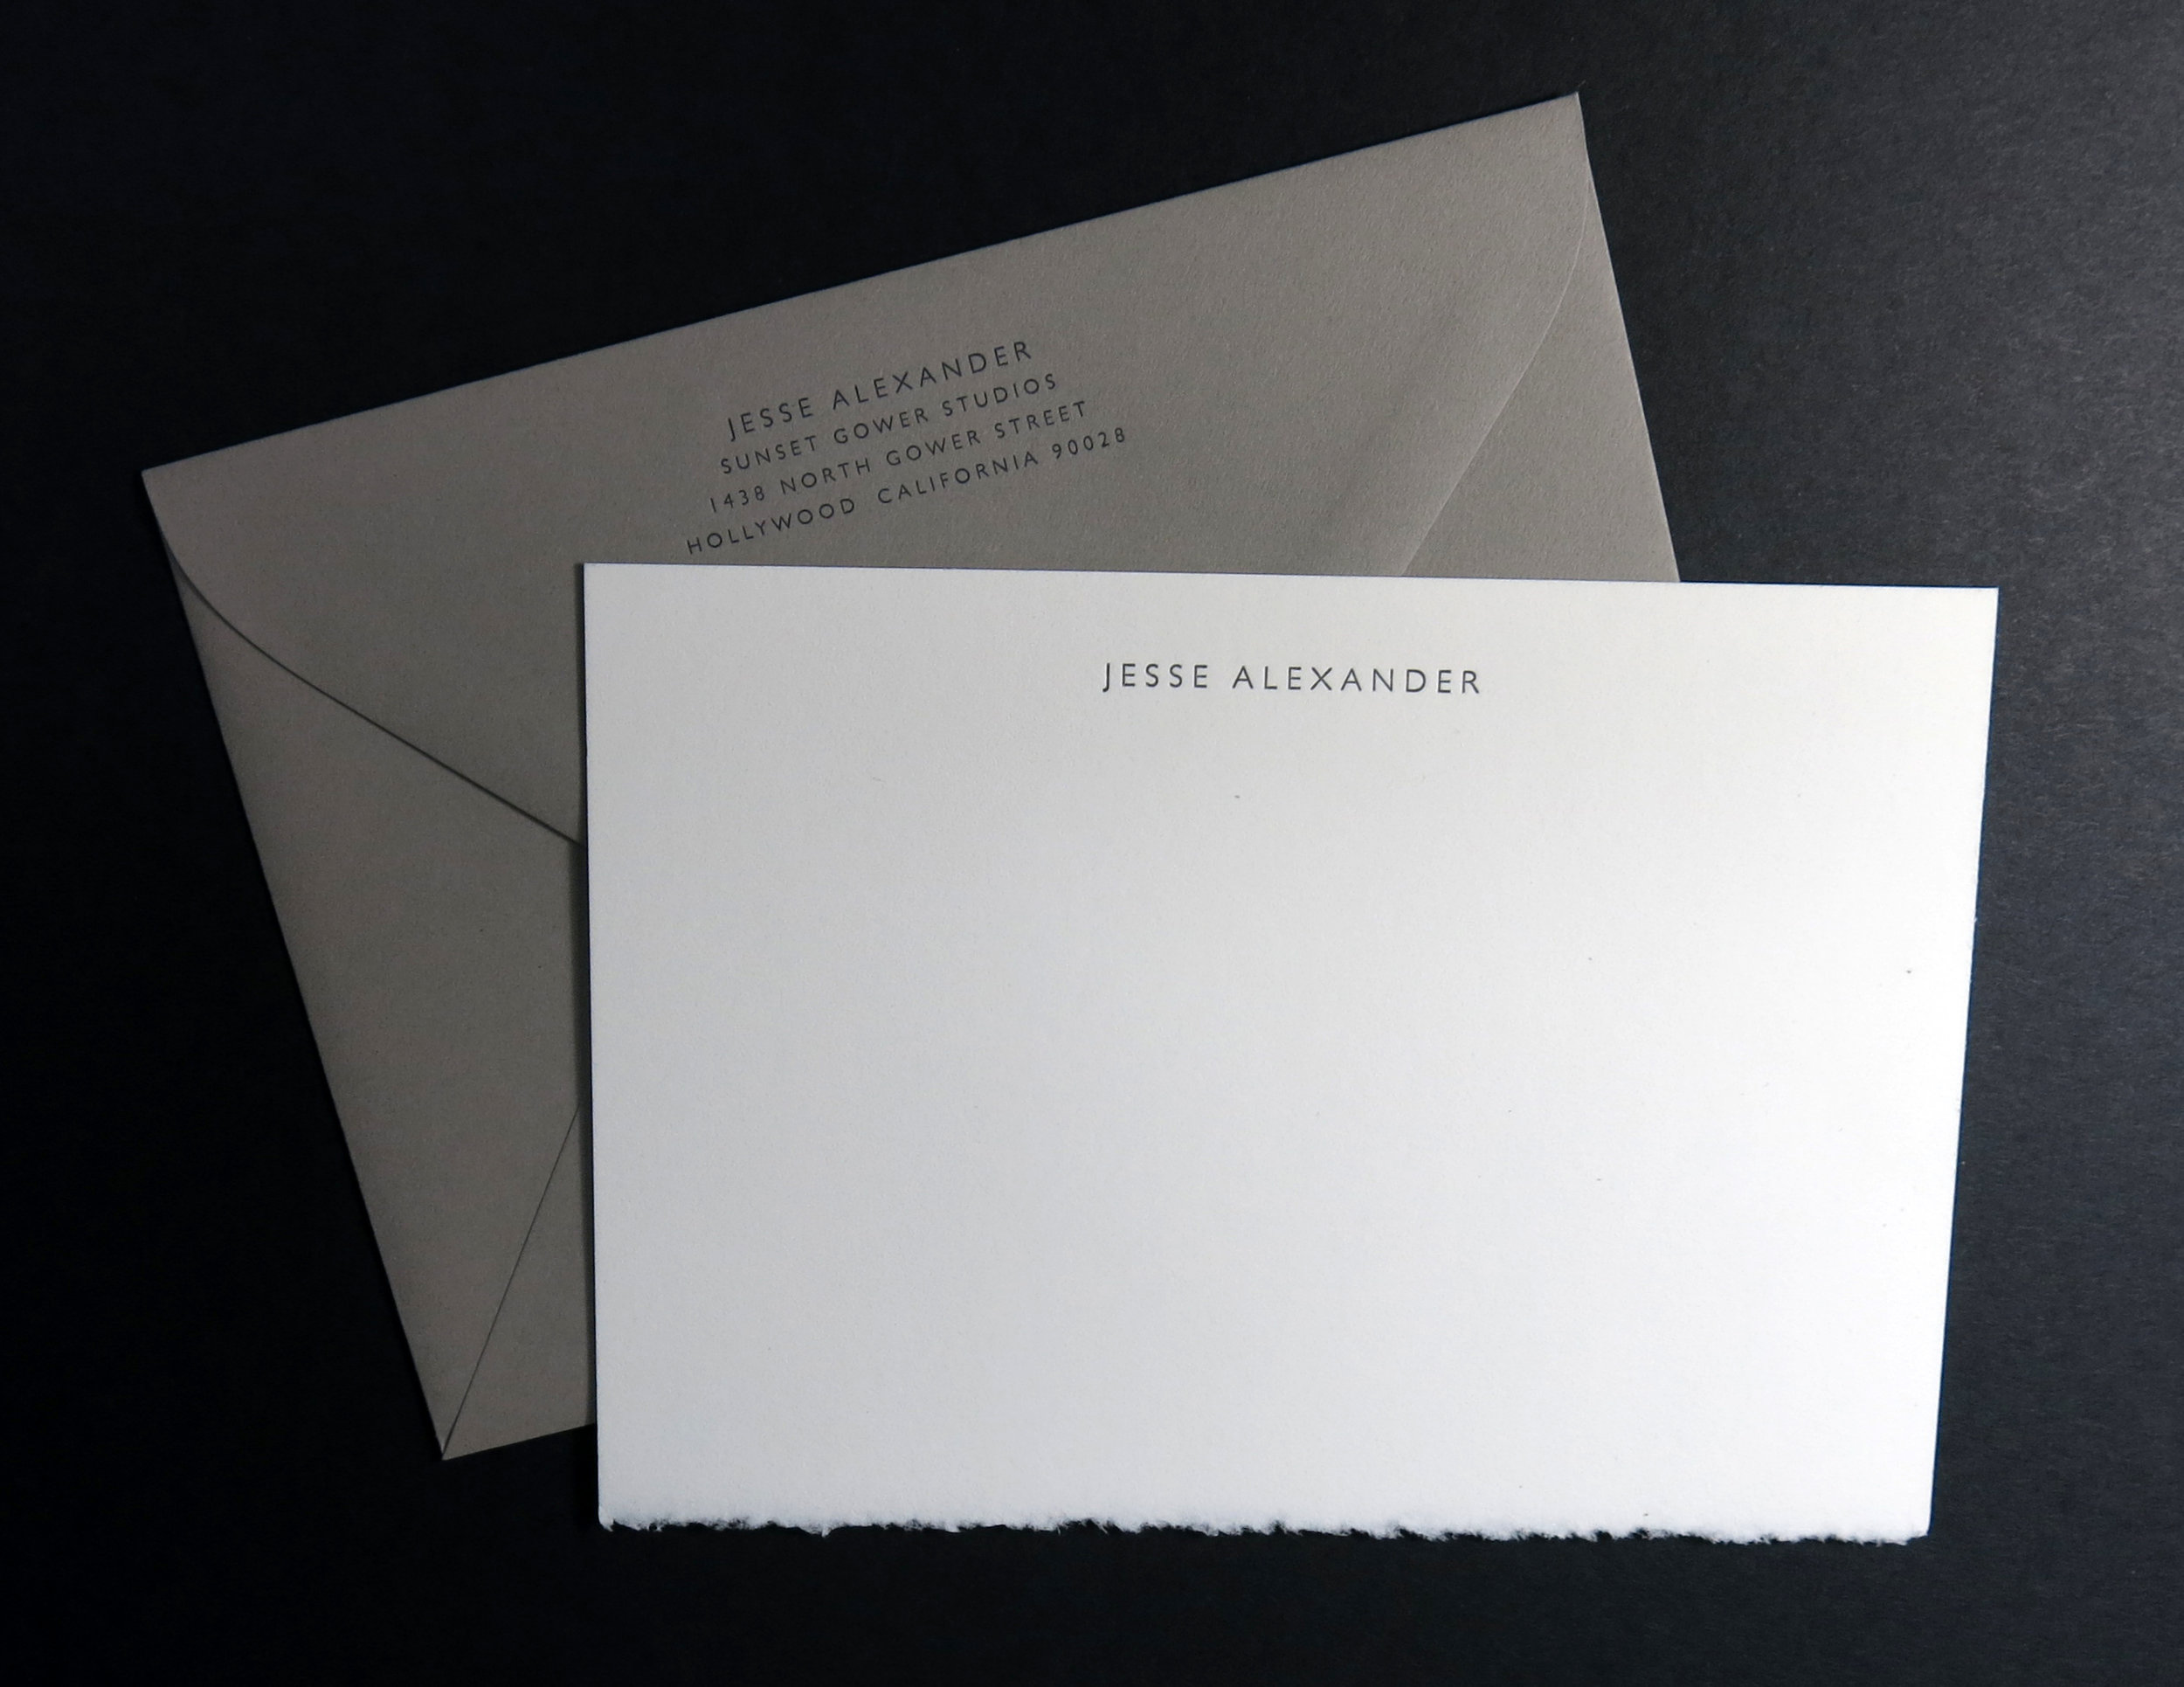 Jesse Alexander Notecard.jpg